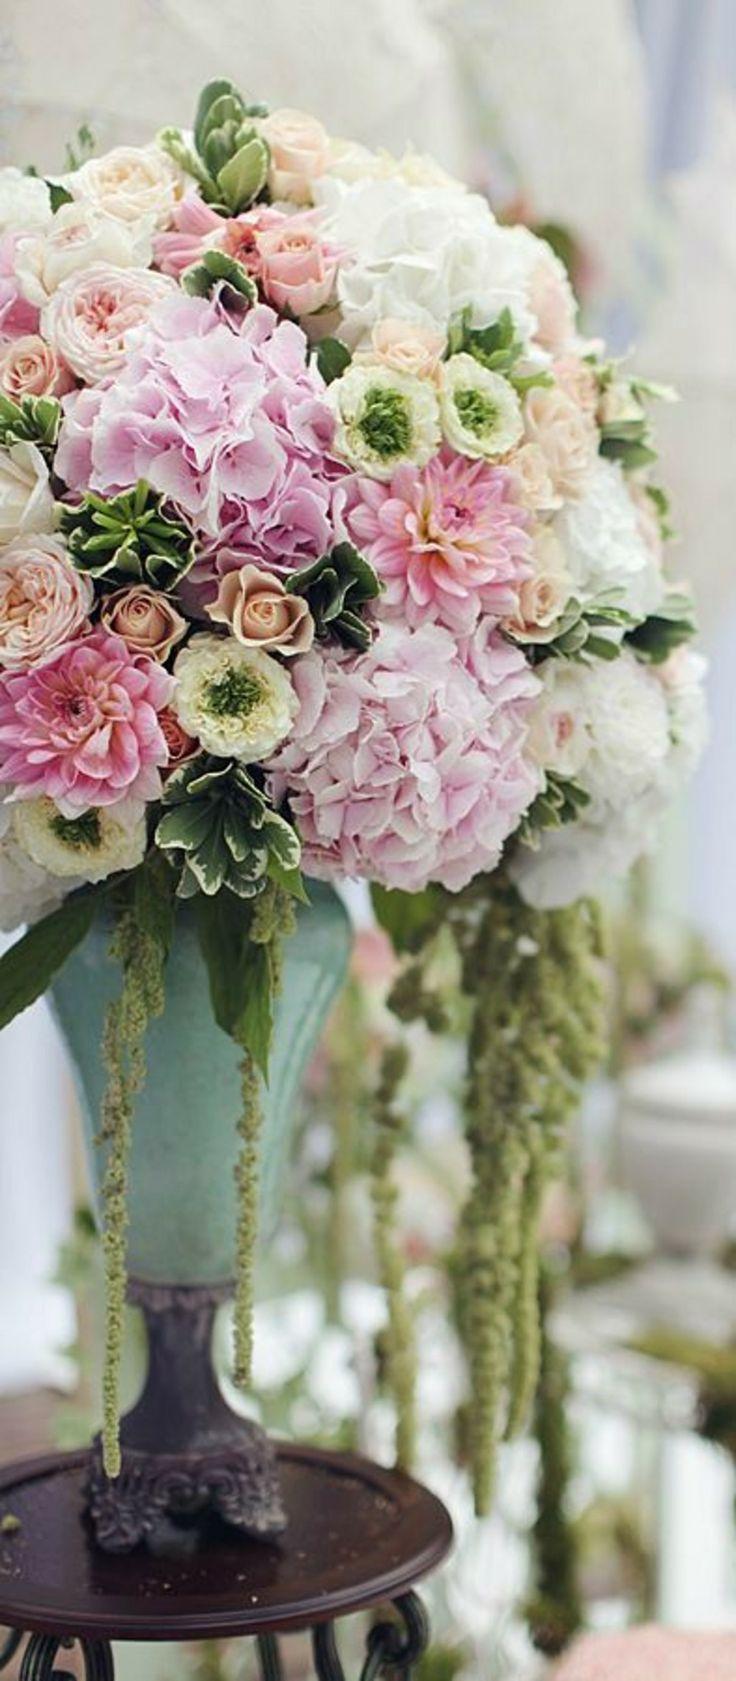 high centerpiece wedding flowers pinterest florists flowers and floral arrangement. Black Bedroom Furniture Sets. Home Design Ideas